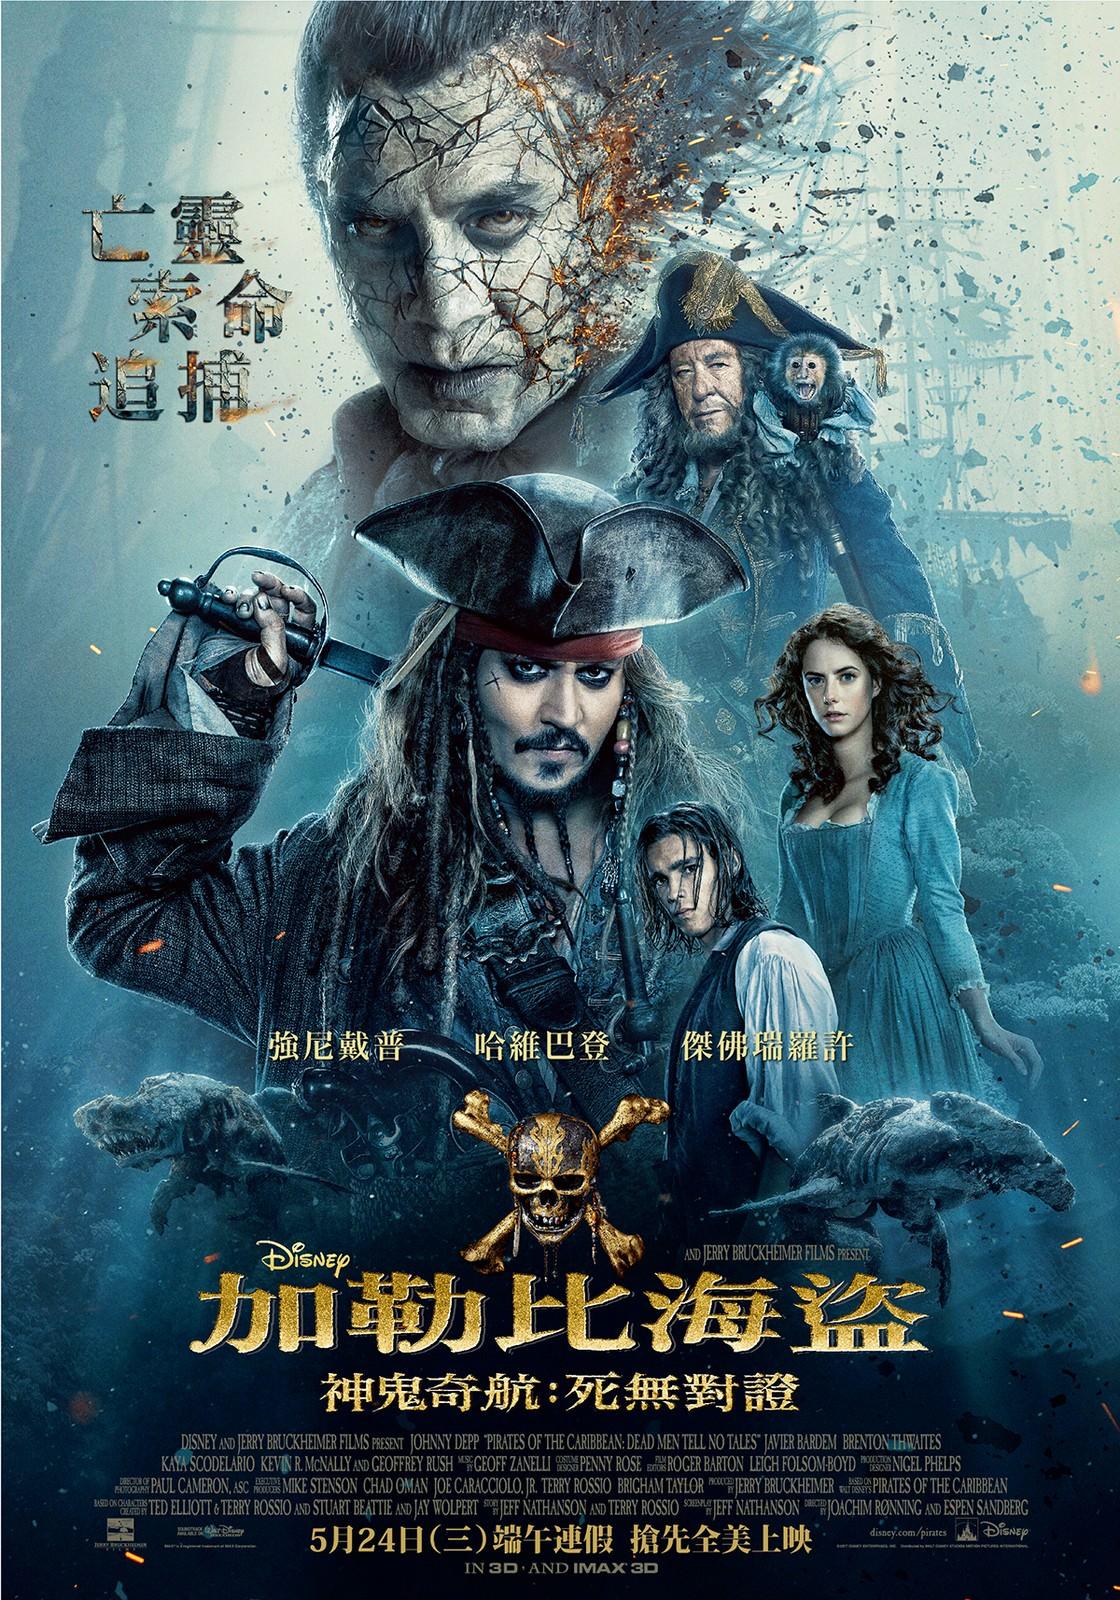 Movie, Pirates of the Caribbean: Dead Men Tell No Tales(美國, 2017年) / 加勒比海盜 神鬼奇航:死無對證(台灣) / 加勒比海盗5:死无对证(中國) / 加勒比海盜:惡靈啟航(香港), 電影海報, 台灣